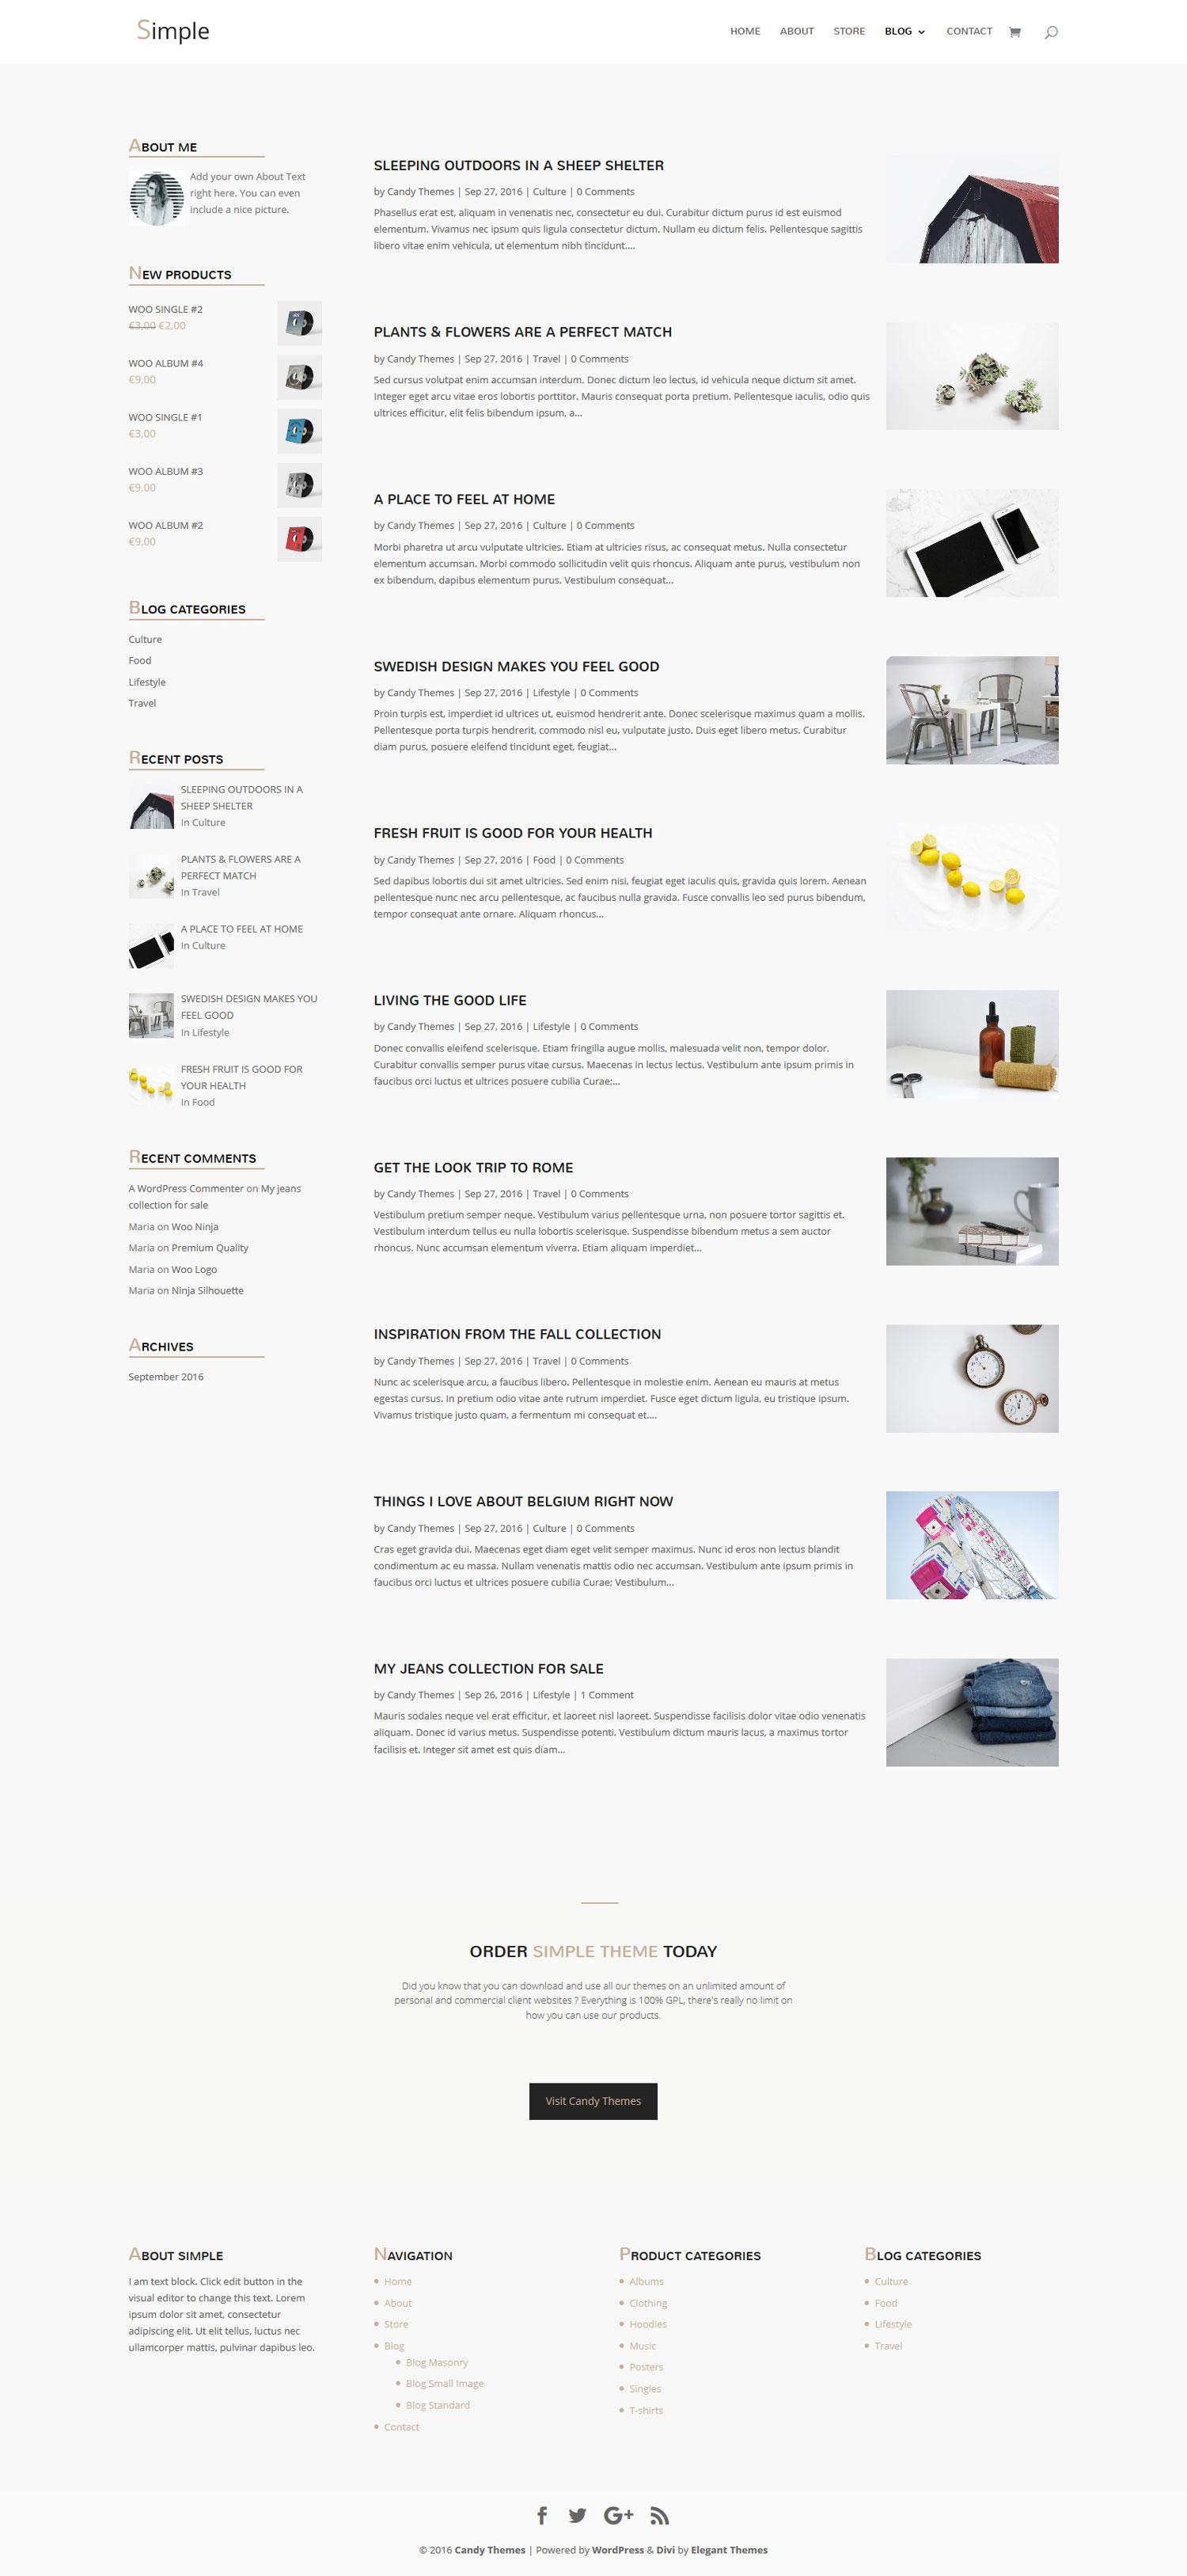 Blog Small Image